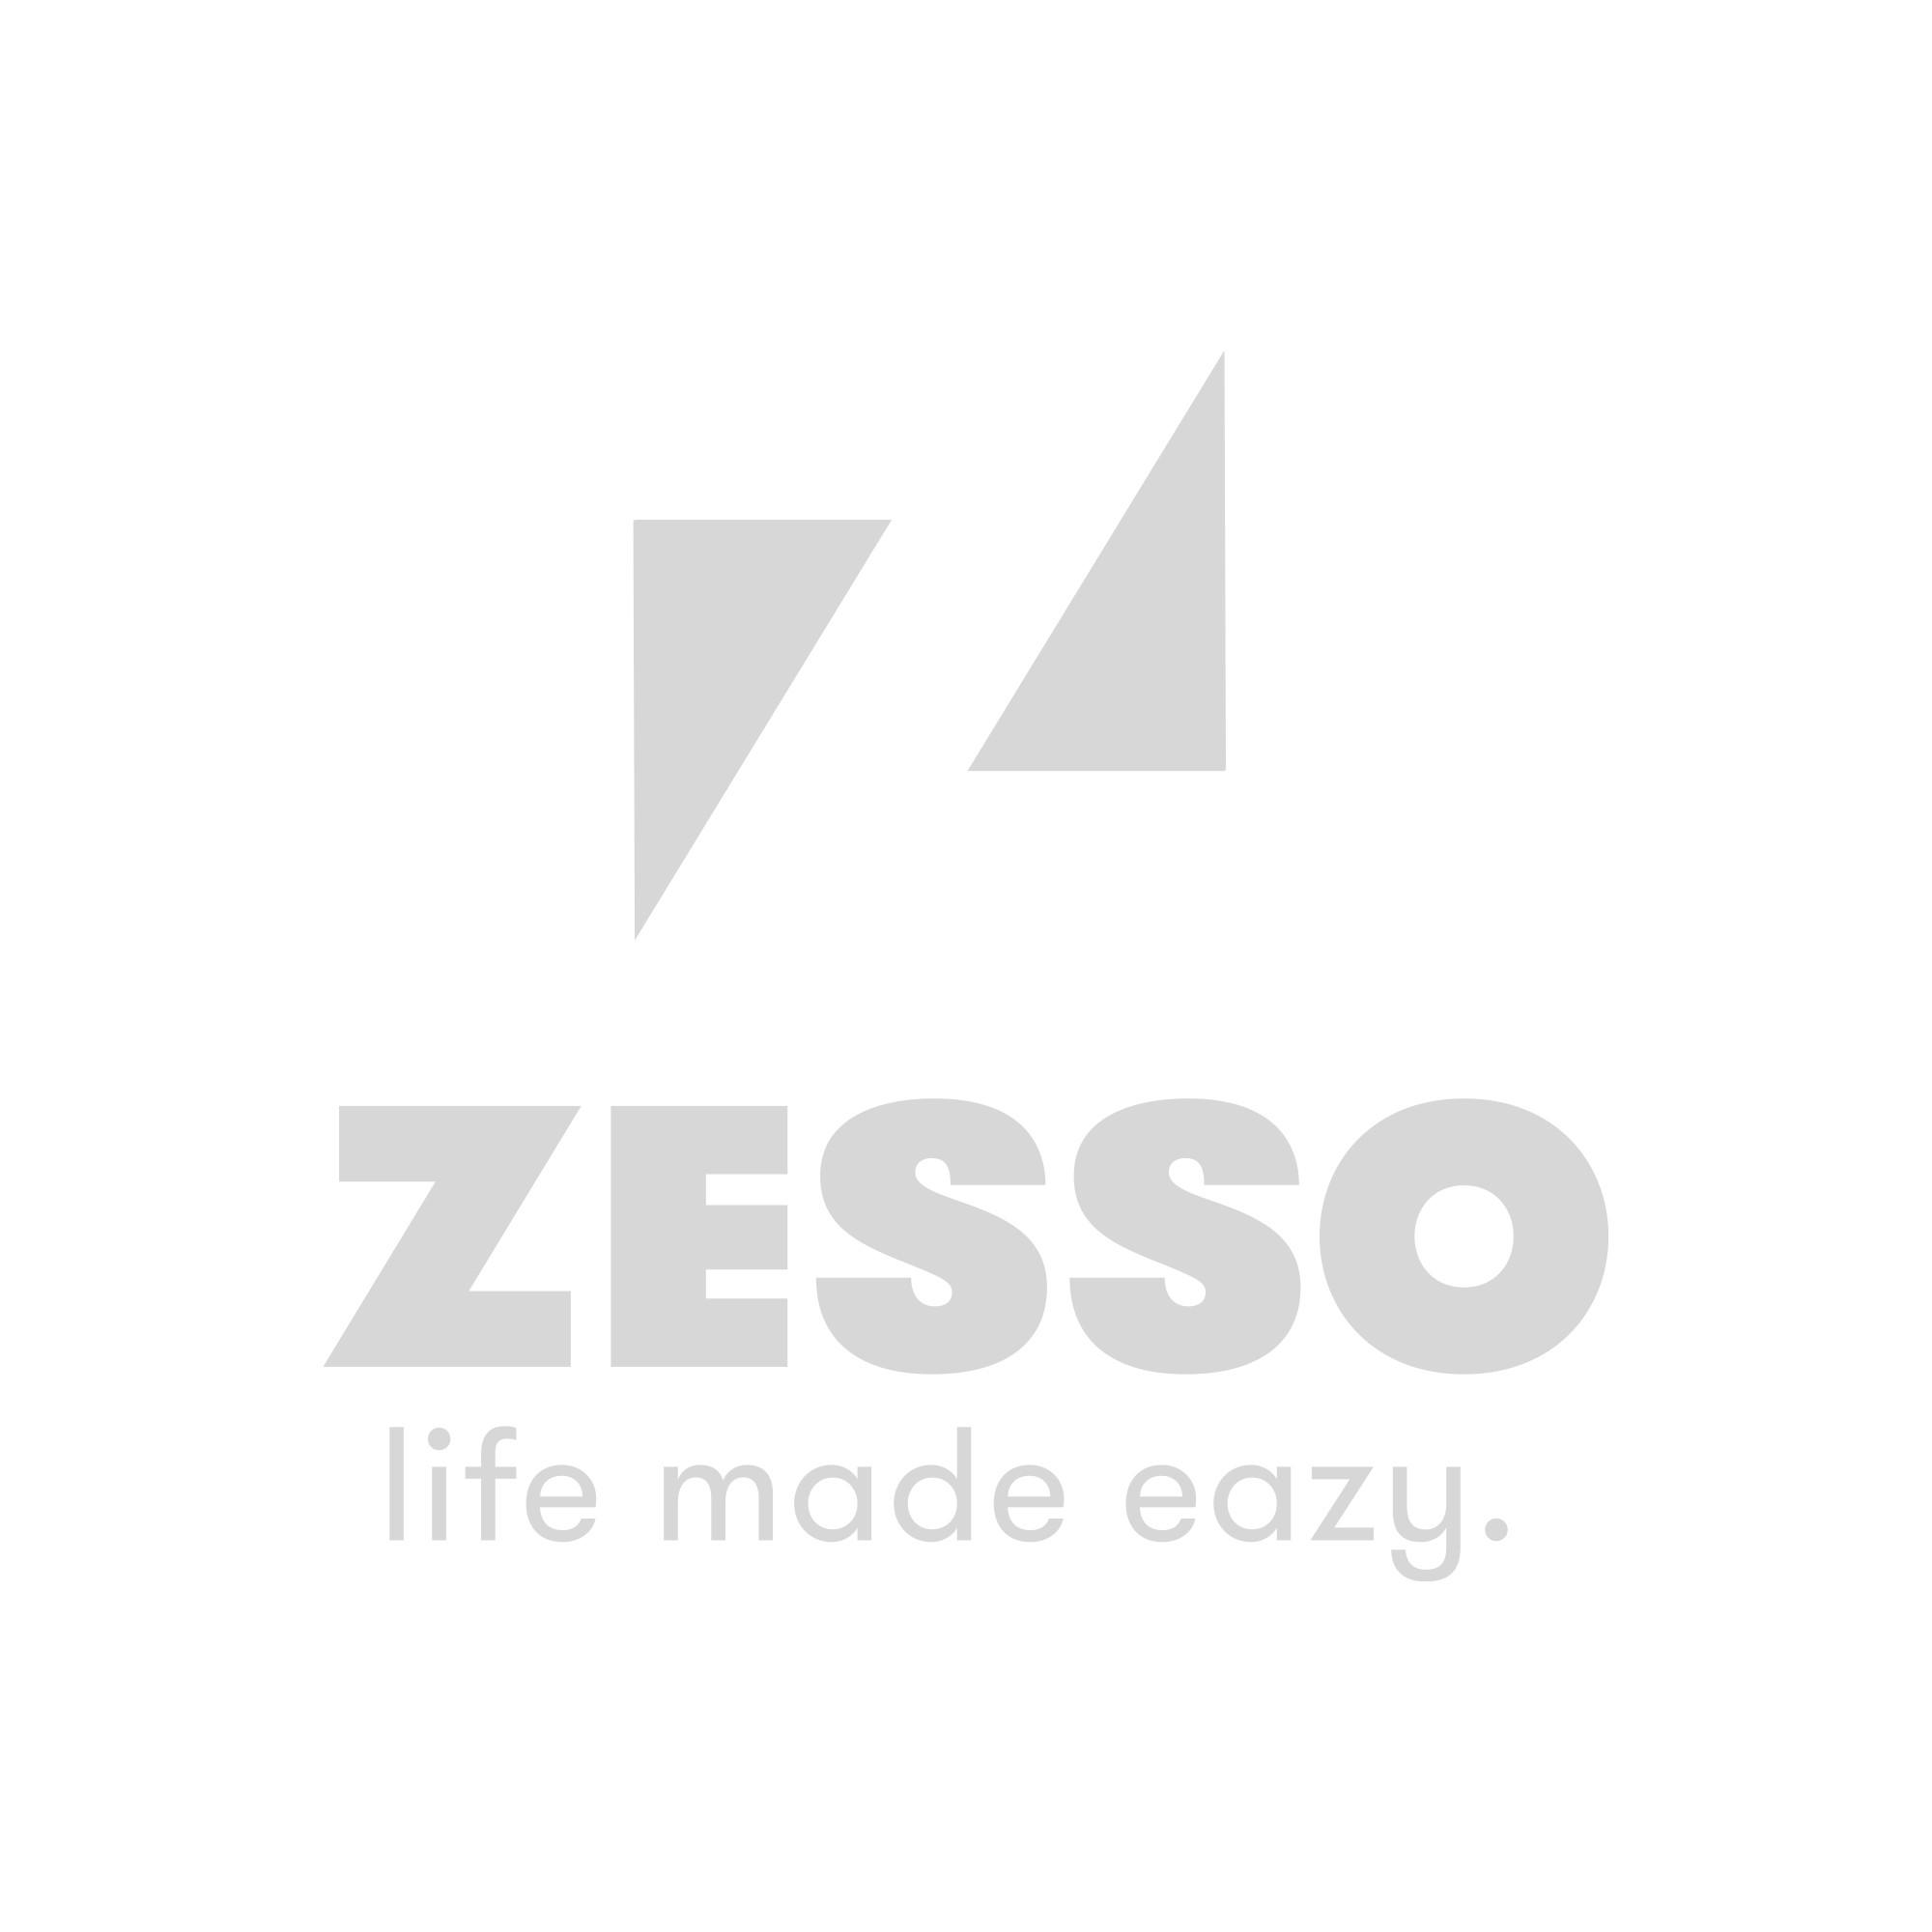 Brabantia Pedaalemmer 29 Liter.Brabantia Pedaalemmer Newicon Metallic Grey 30l